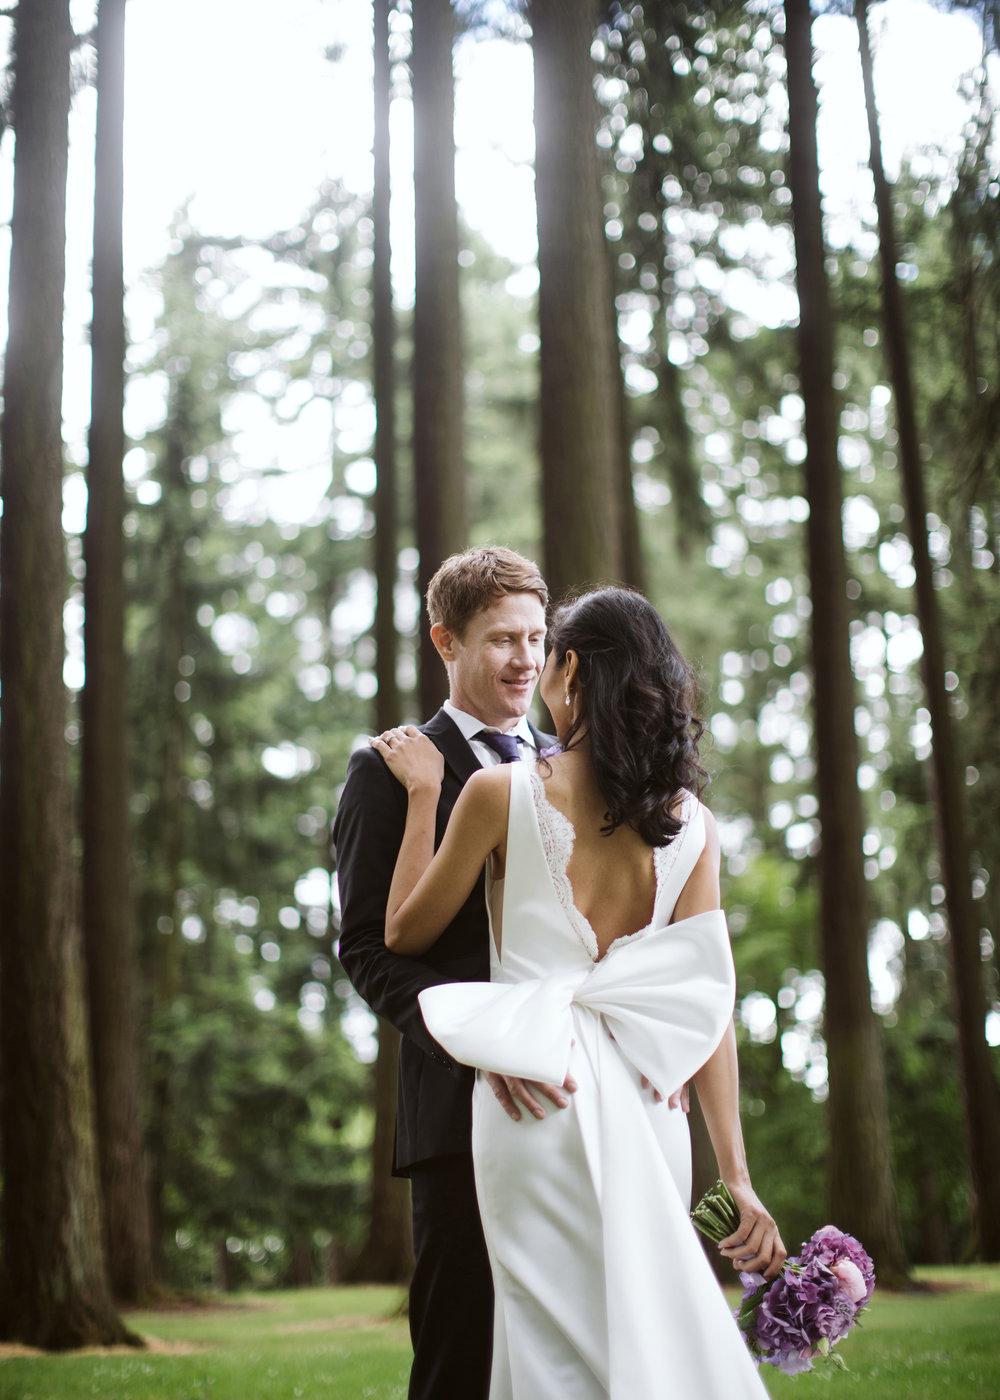 048-daronjackson-jason-picha-wedding.jpg